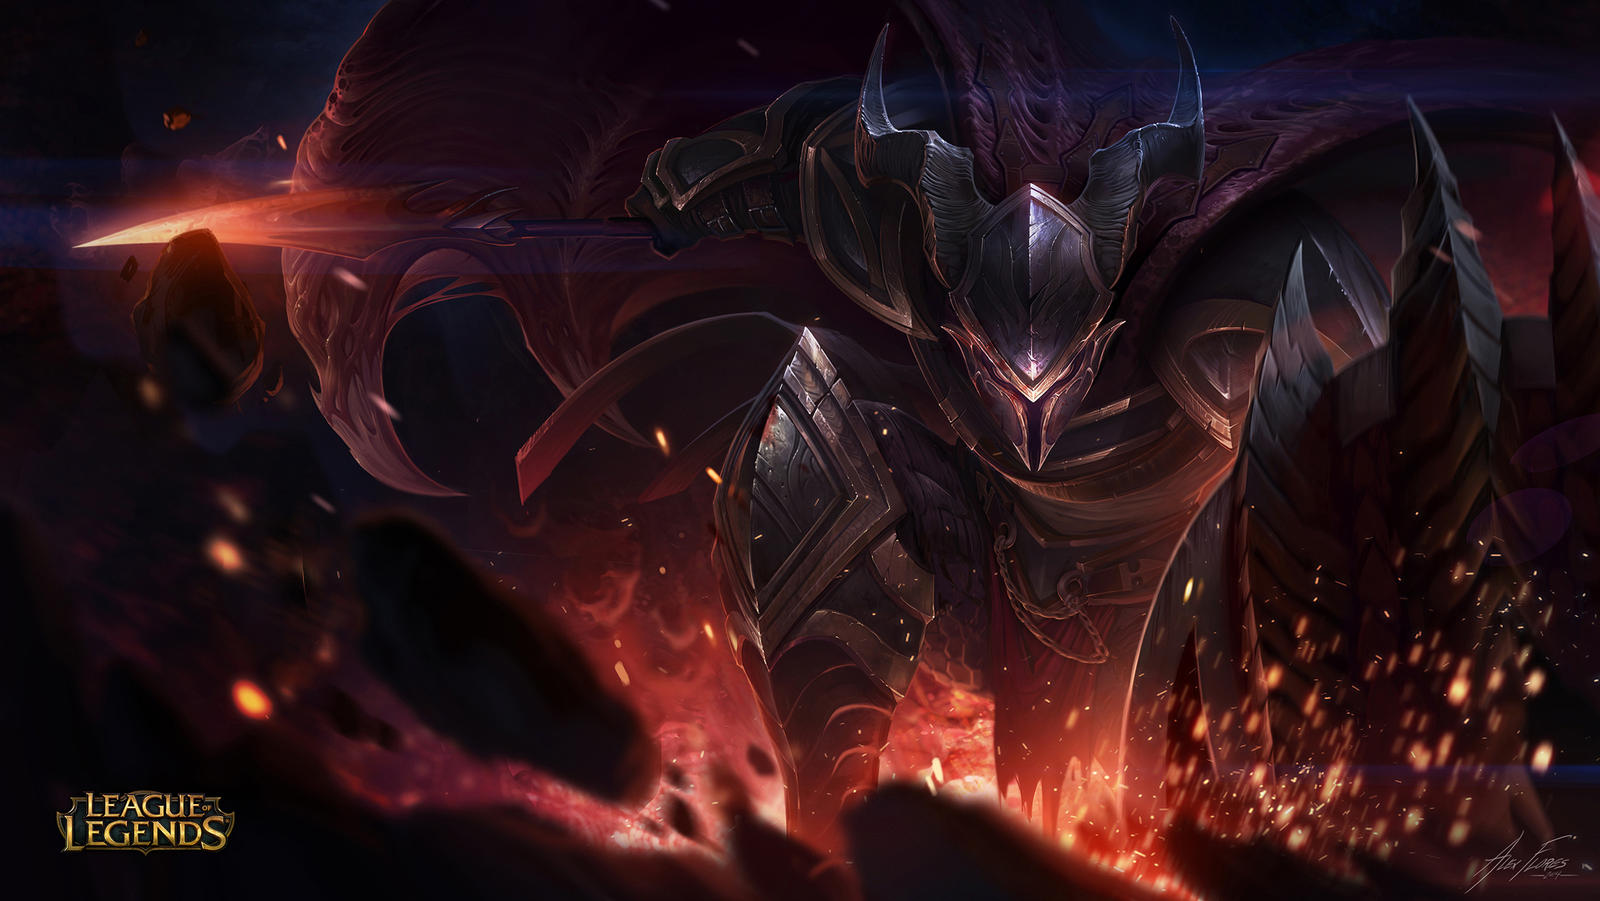 http://img05.deviantart.net/d556/i/2014/113/f/1/dragon_slayer_pantheon_by_alexflores-d7fr57n.jpg Pantheon Skin Dragonslayer